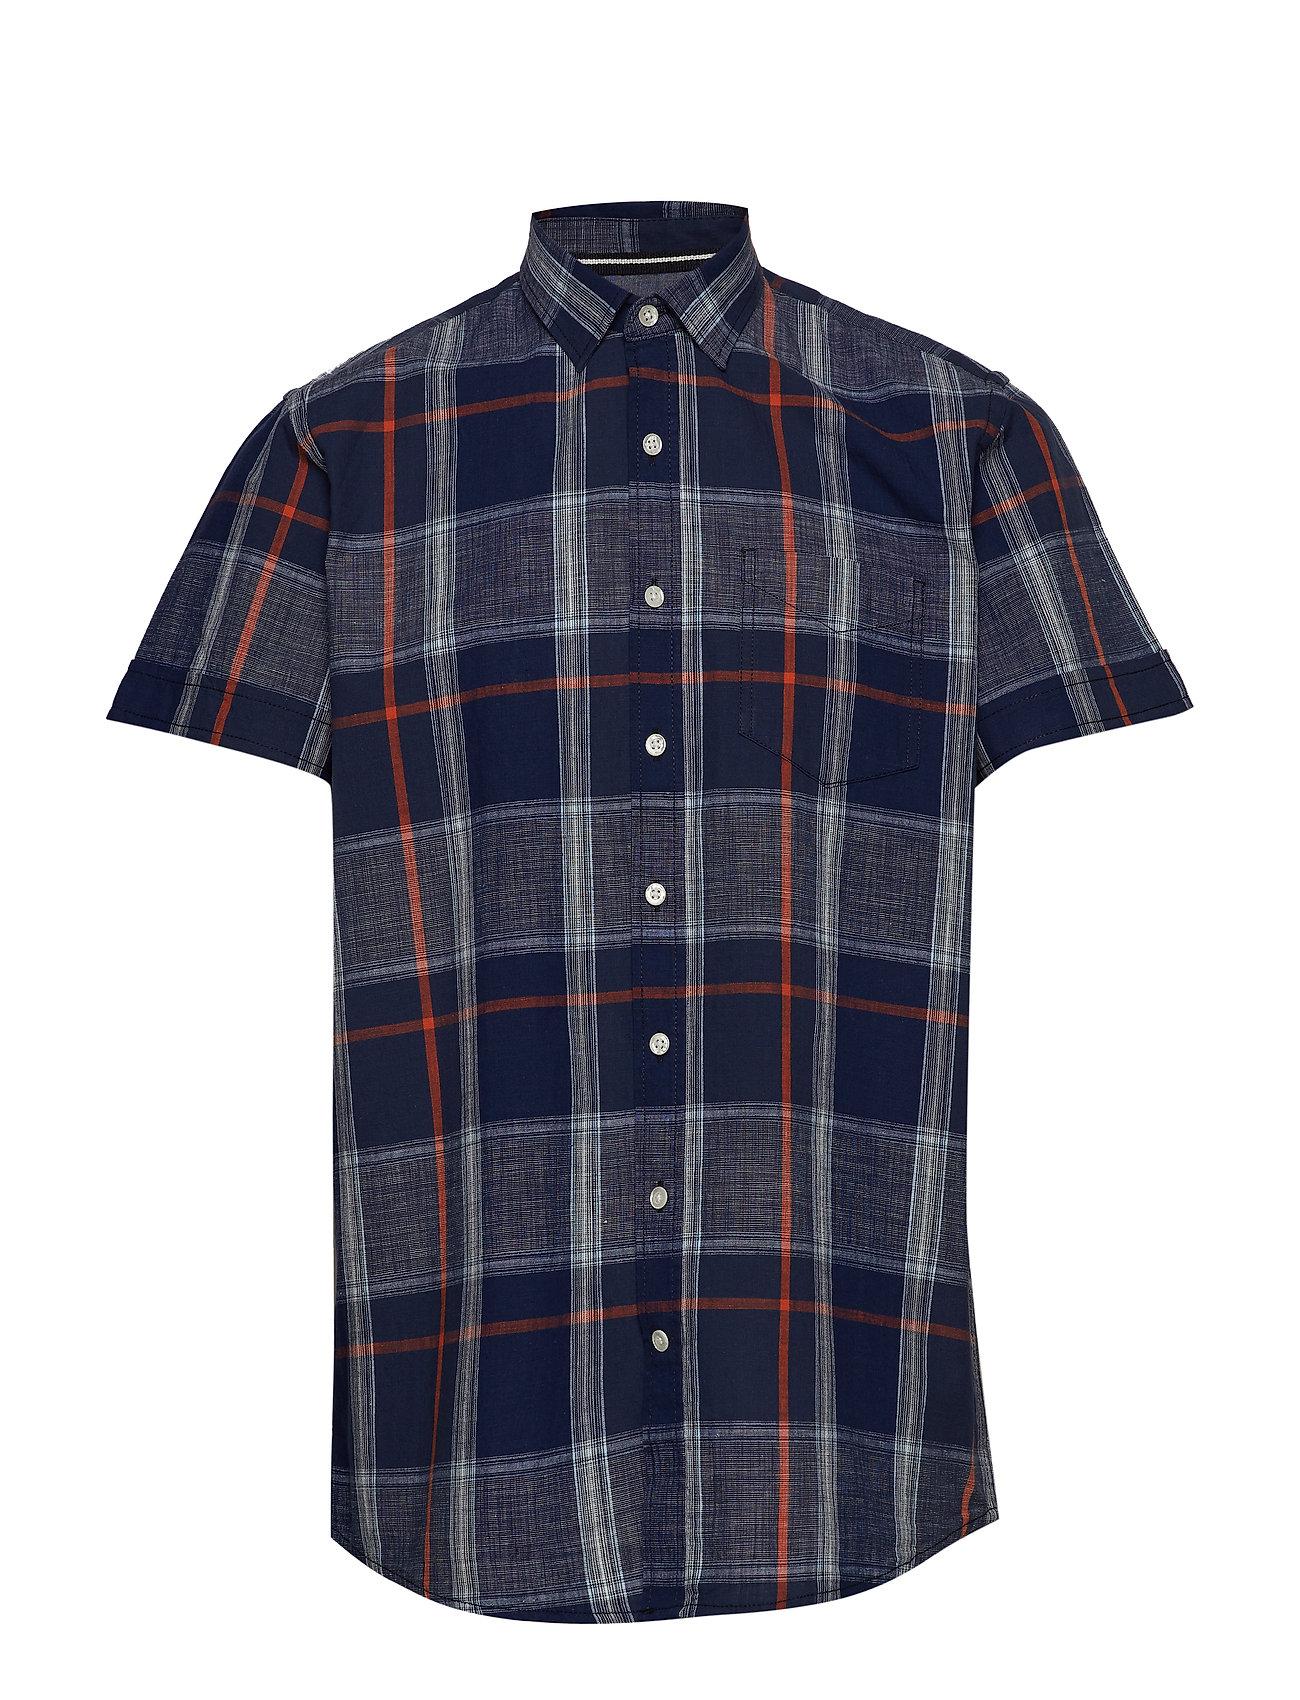 Signal S/S Shirts - ORANGE RUST